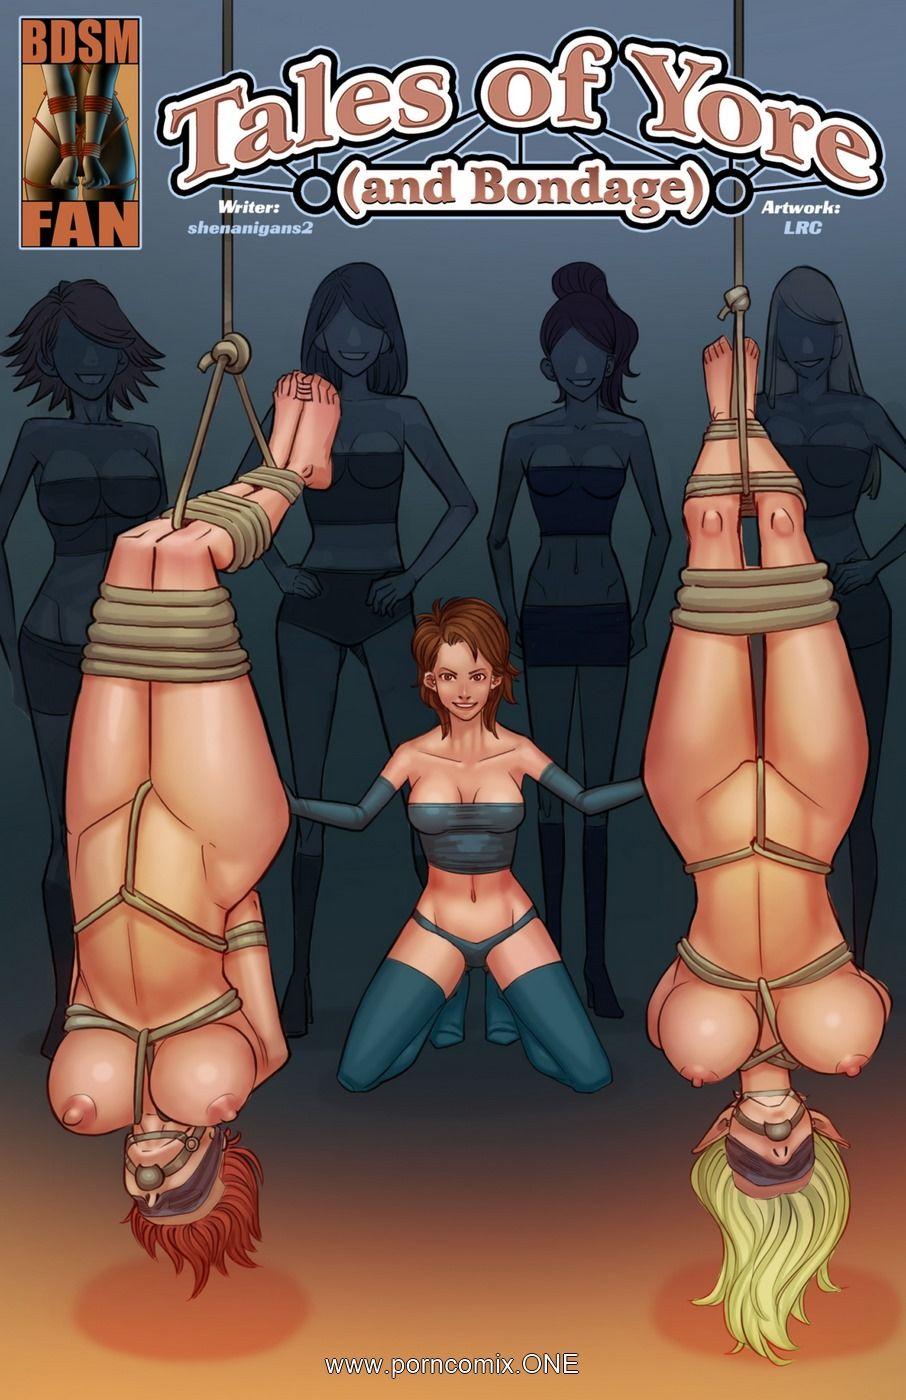 Comdon video free bondage porn comics pron mom